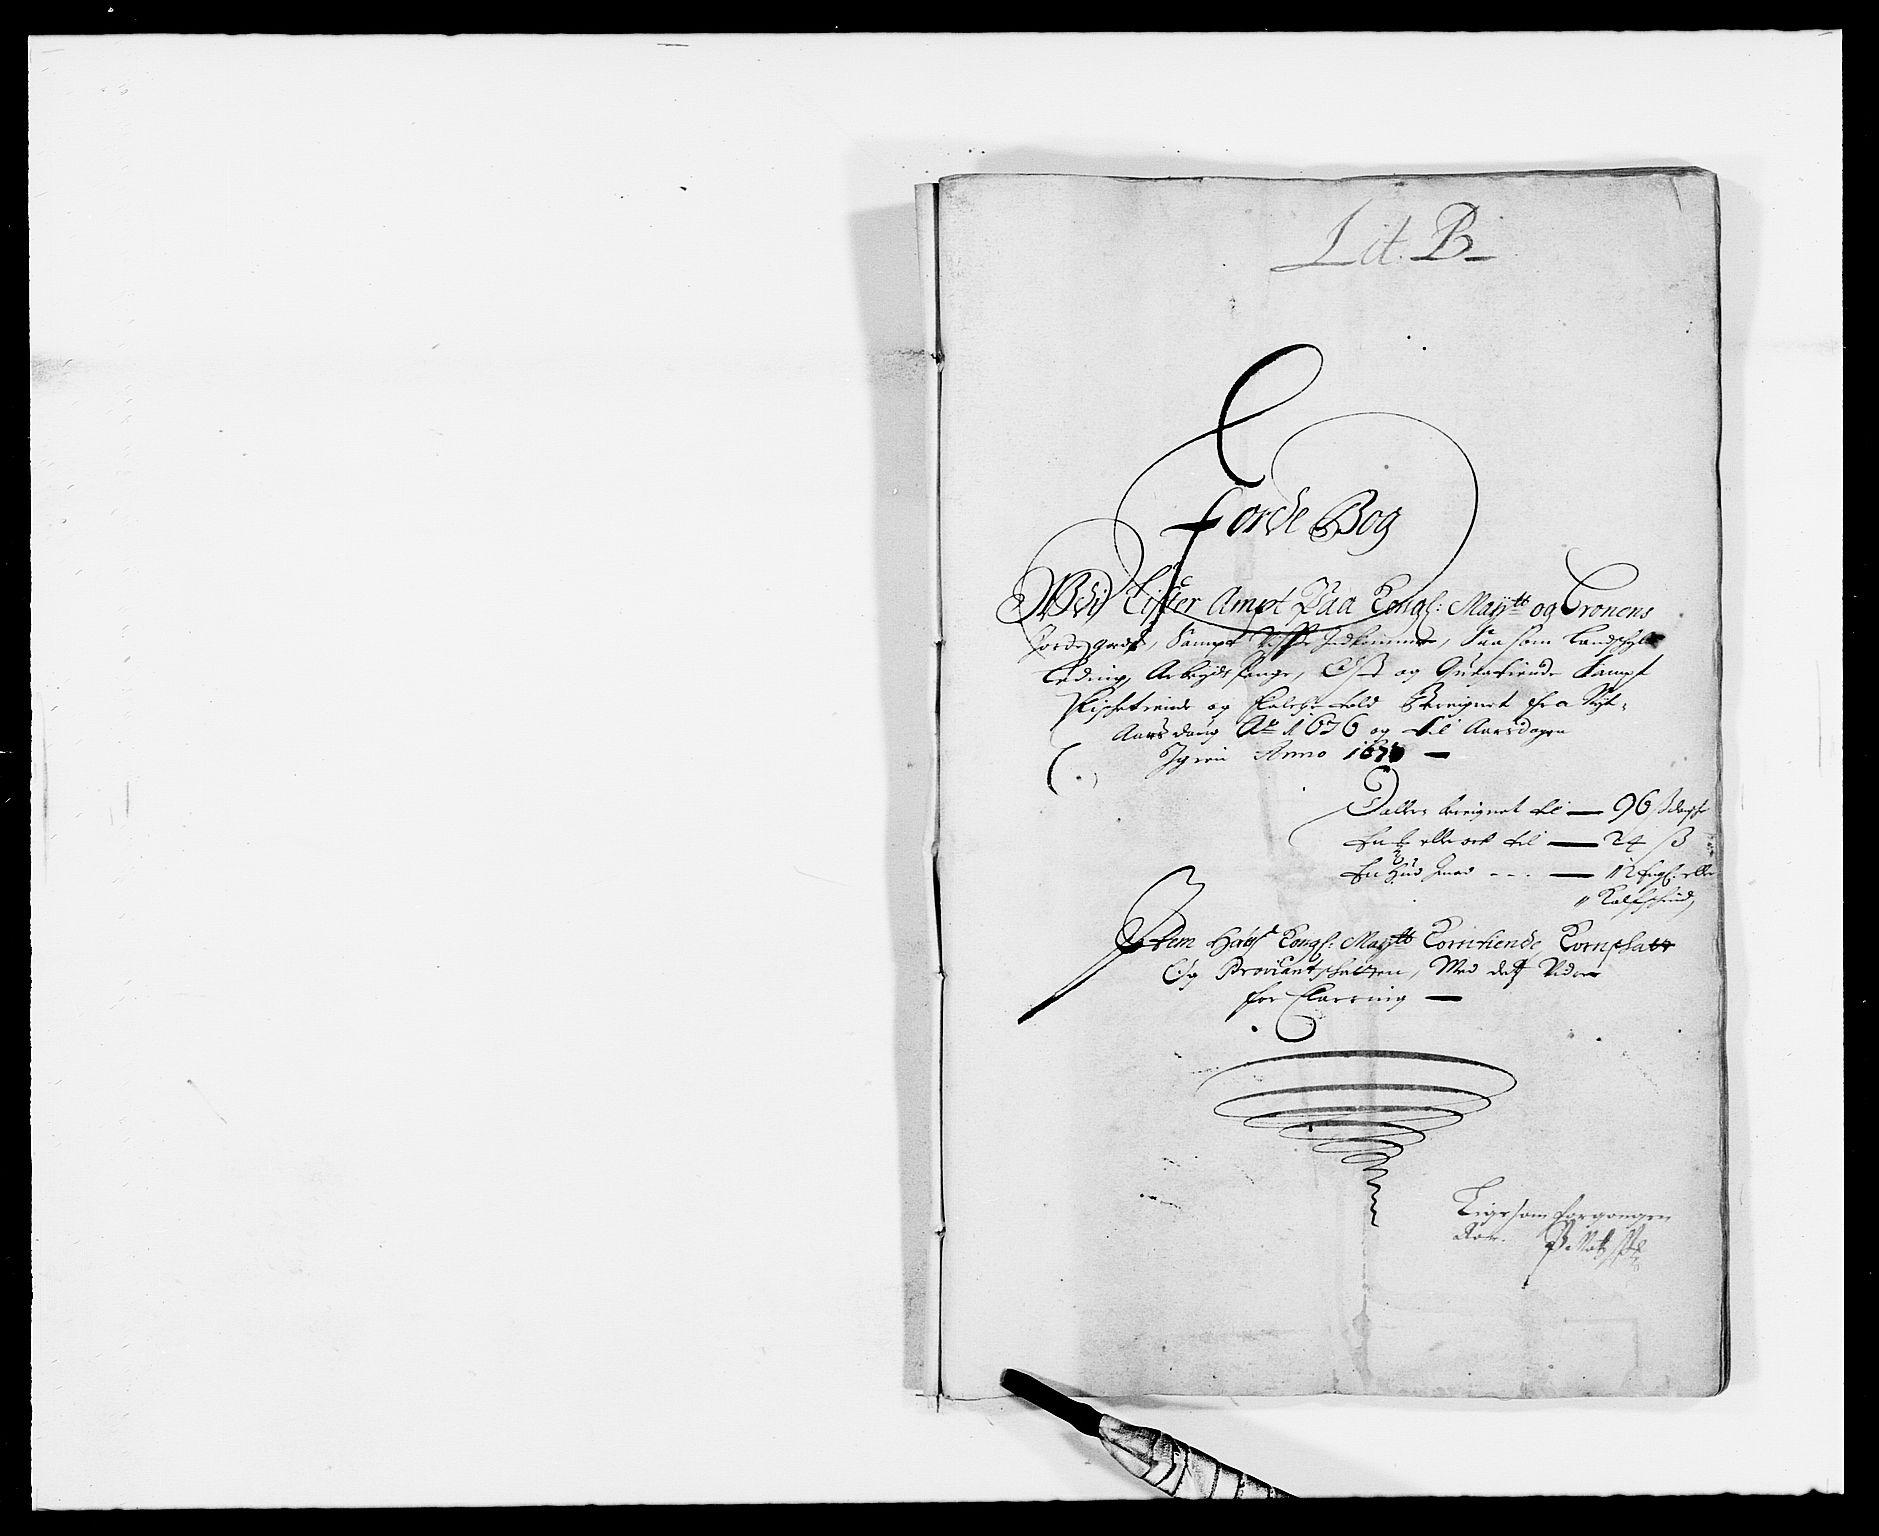 RA, Rentekammeret inntil 1814, Reviderte regnskaper, Fogderegnskap, R41/L2529: Fogderegnskap Lista, 1675-1676, s. 121